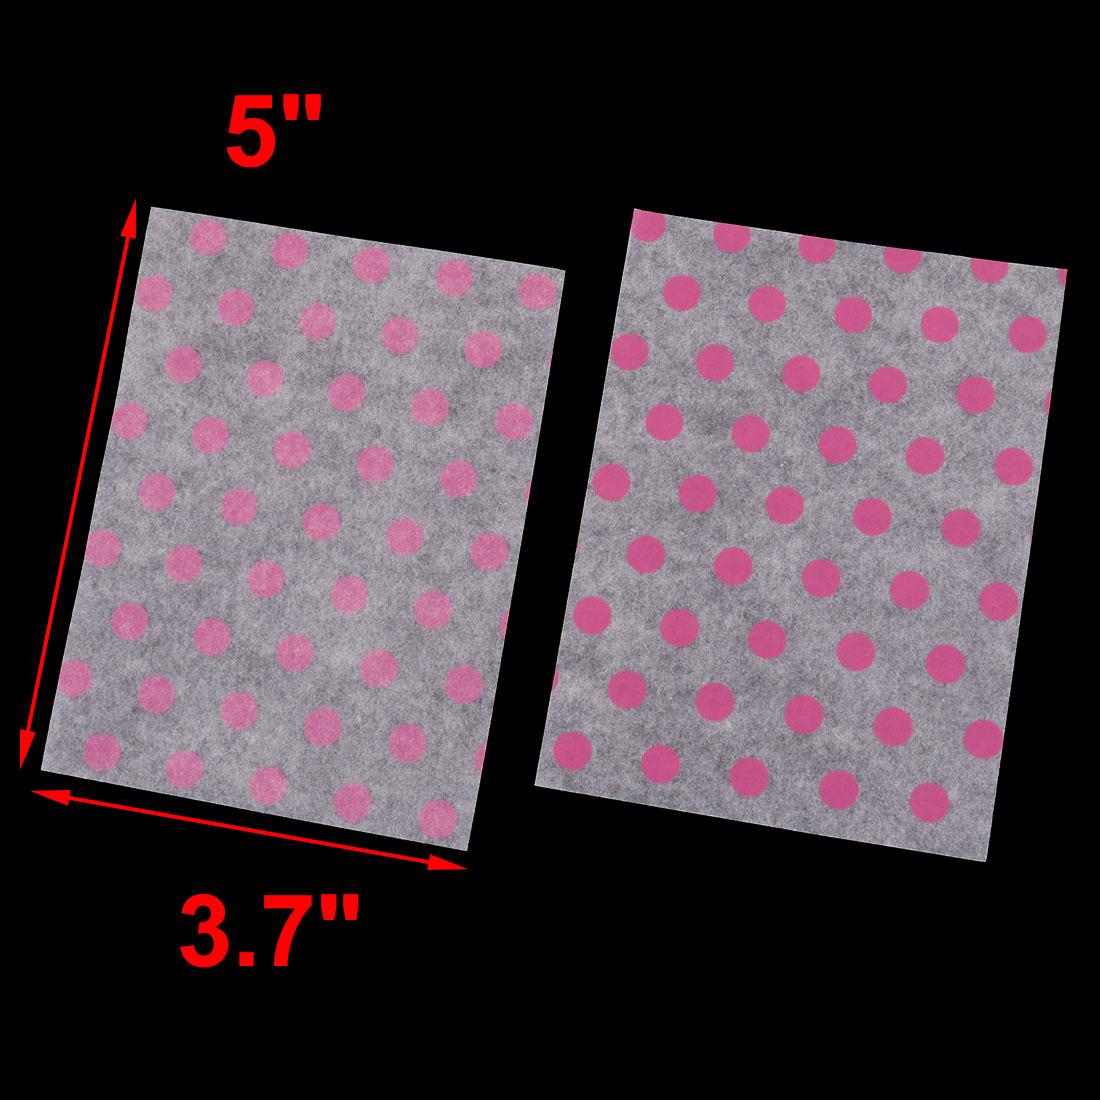 Wedding Washi Paper Dot Print Sugar Candy Cookie Cupcake Wrapping Fuchsia 100pcs - image 1 of 3